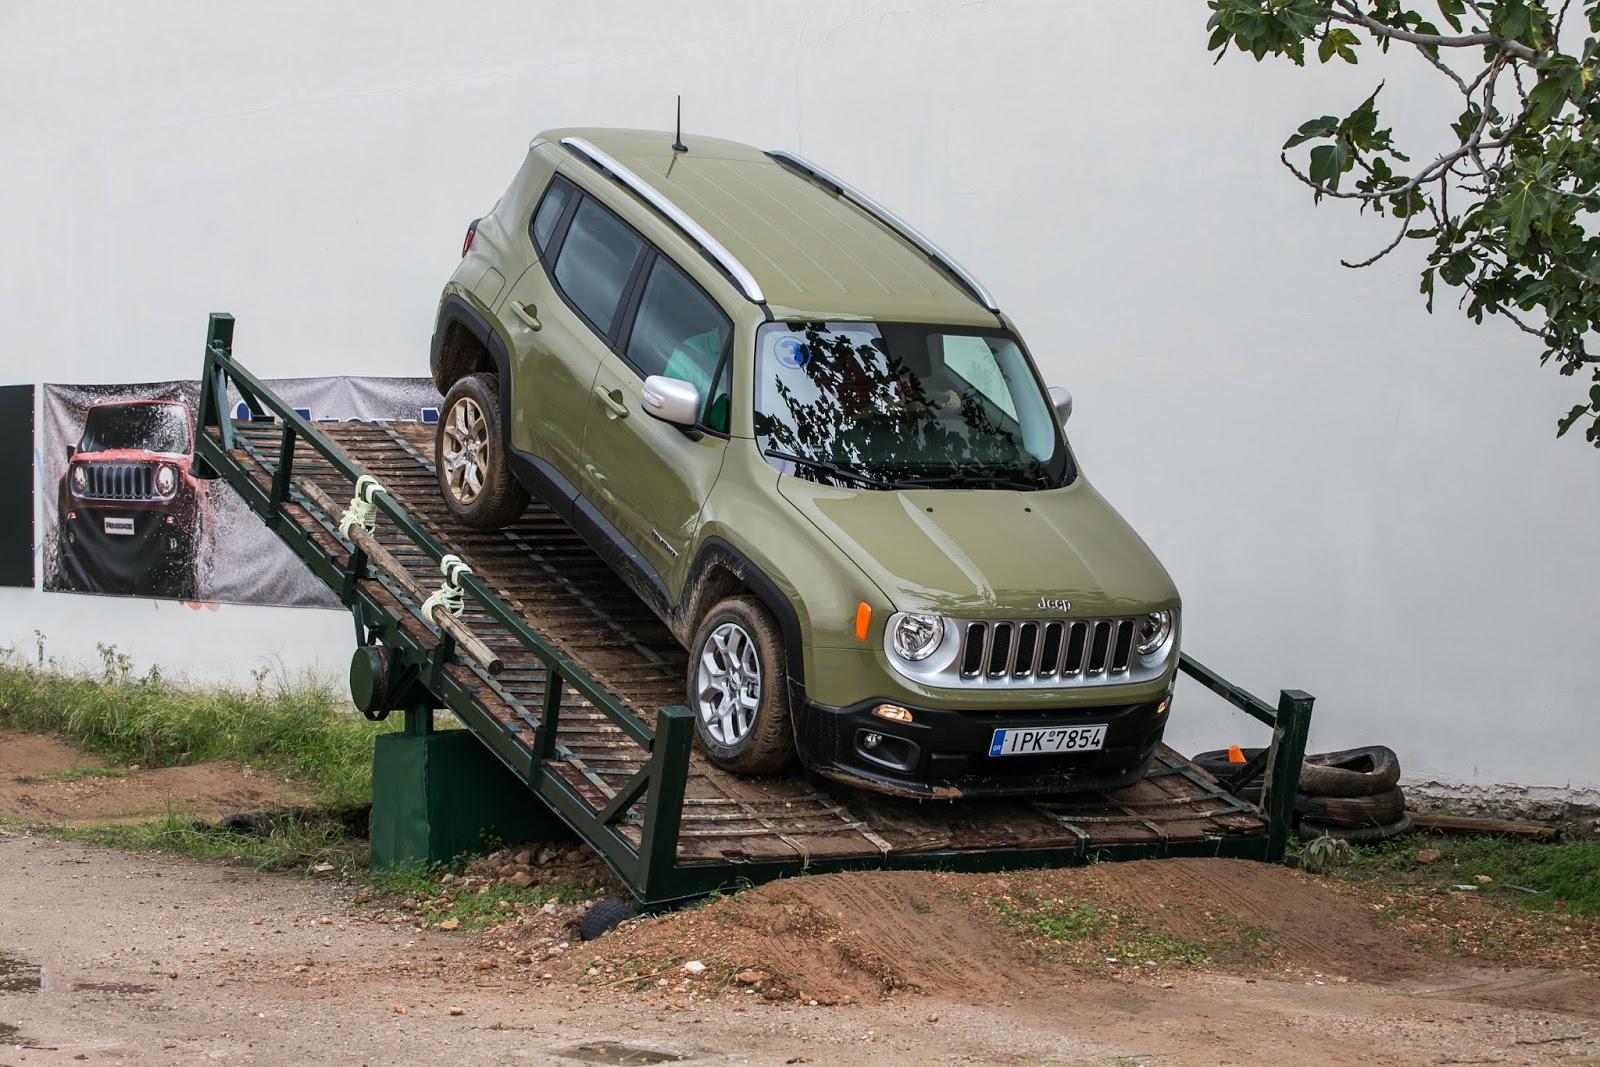 JEEP%2BCAMP KF 1555 Πετάμε ένα Jeep Renegade σε λάσπες, πέτρες, άμμο, λίμνες. Θα τα καταφέρει; Jeep, Jeep Renegade, Renegade, SUV, TEST, zblog, ΔΟΚΙΜΕΣ